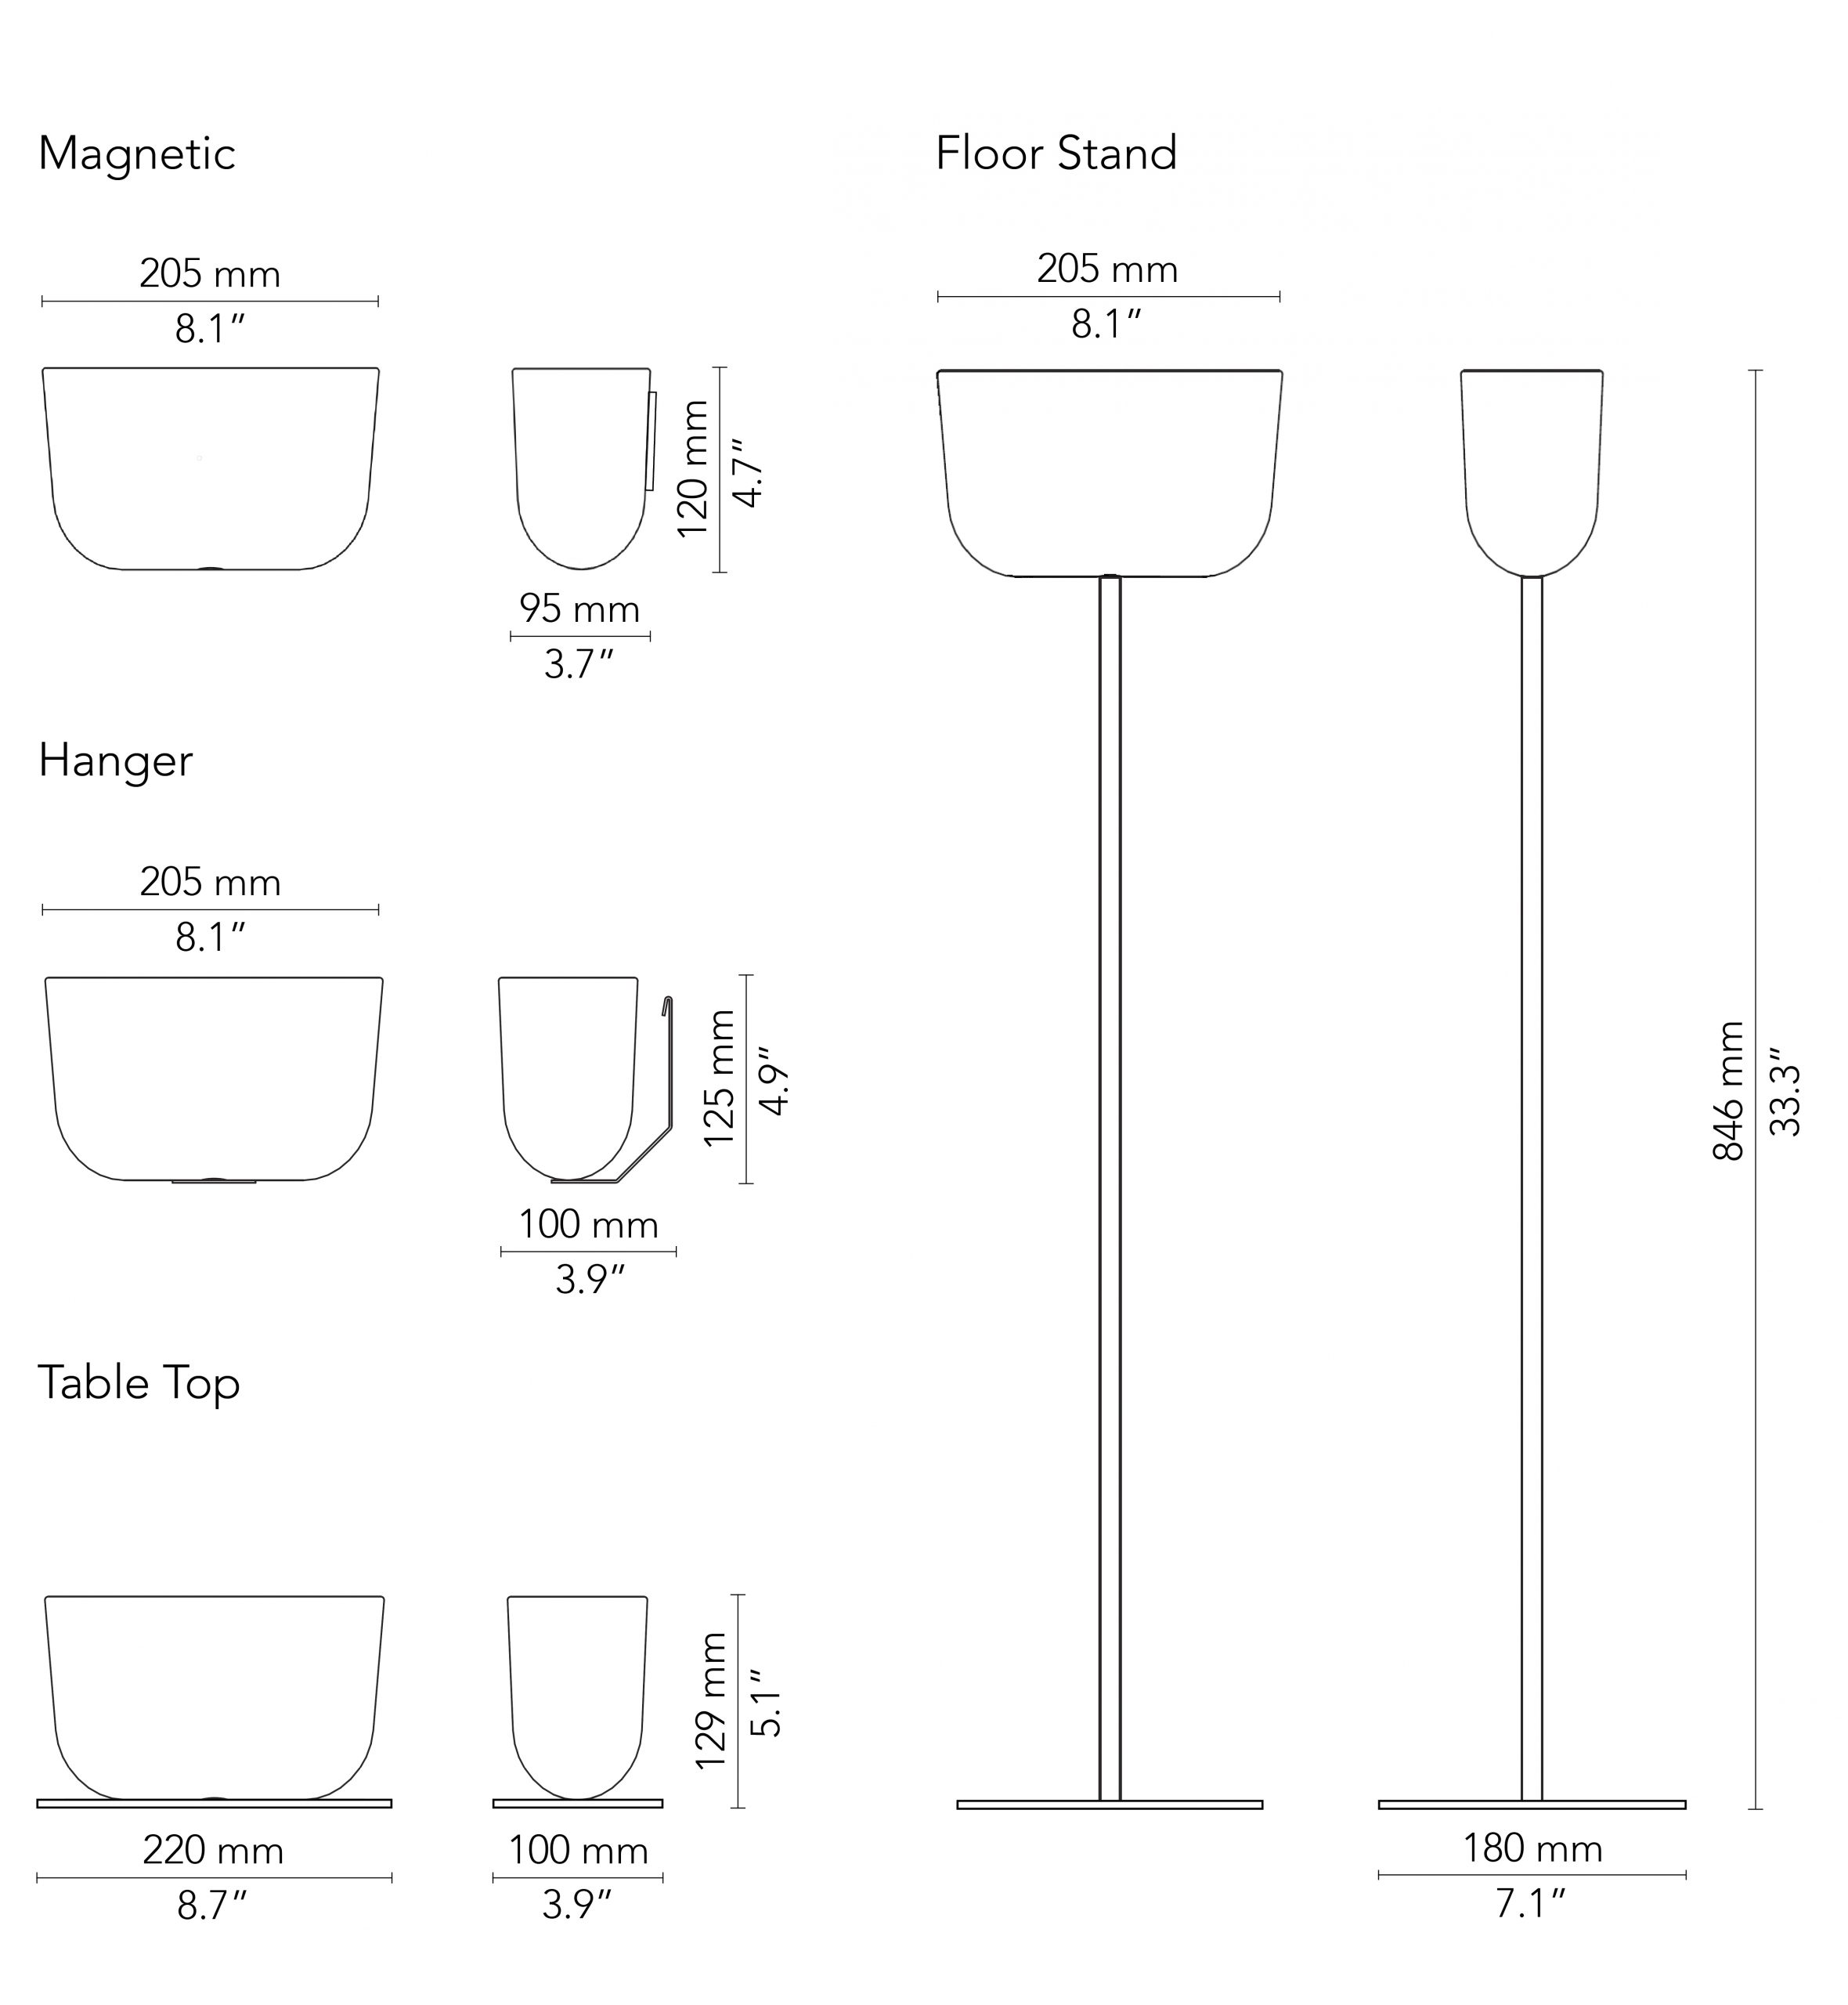 CHAT BOARD Storage Unit drawings w. mm measurements